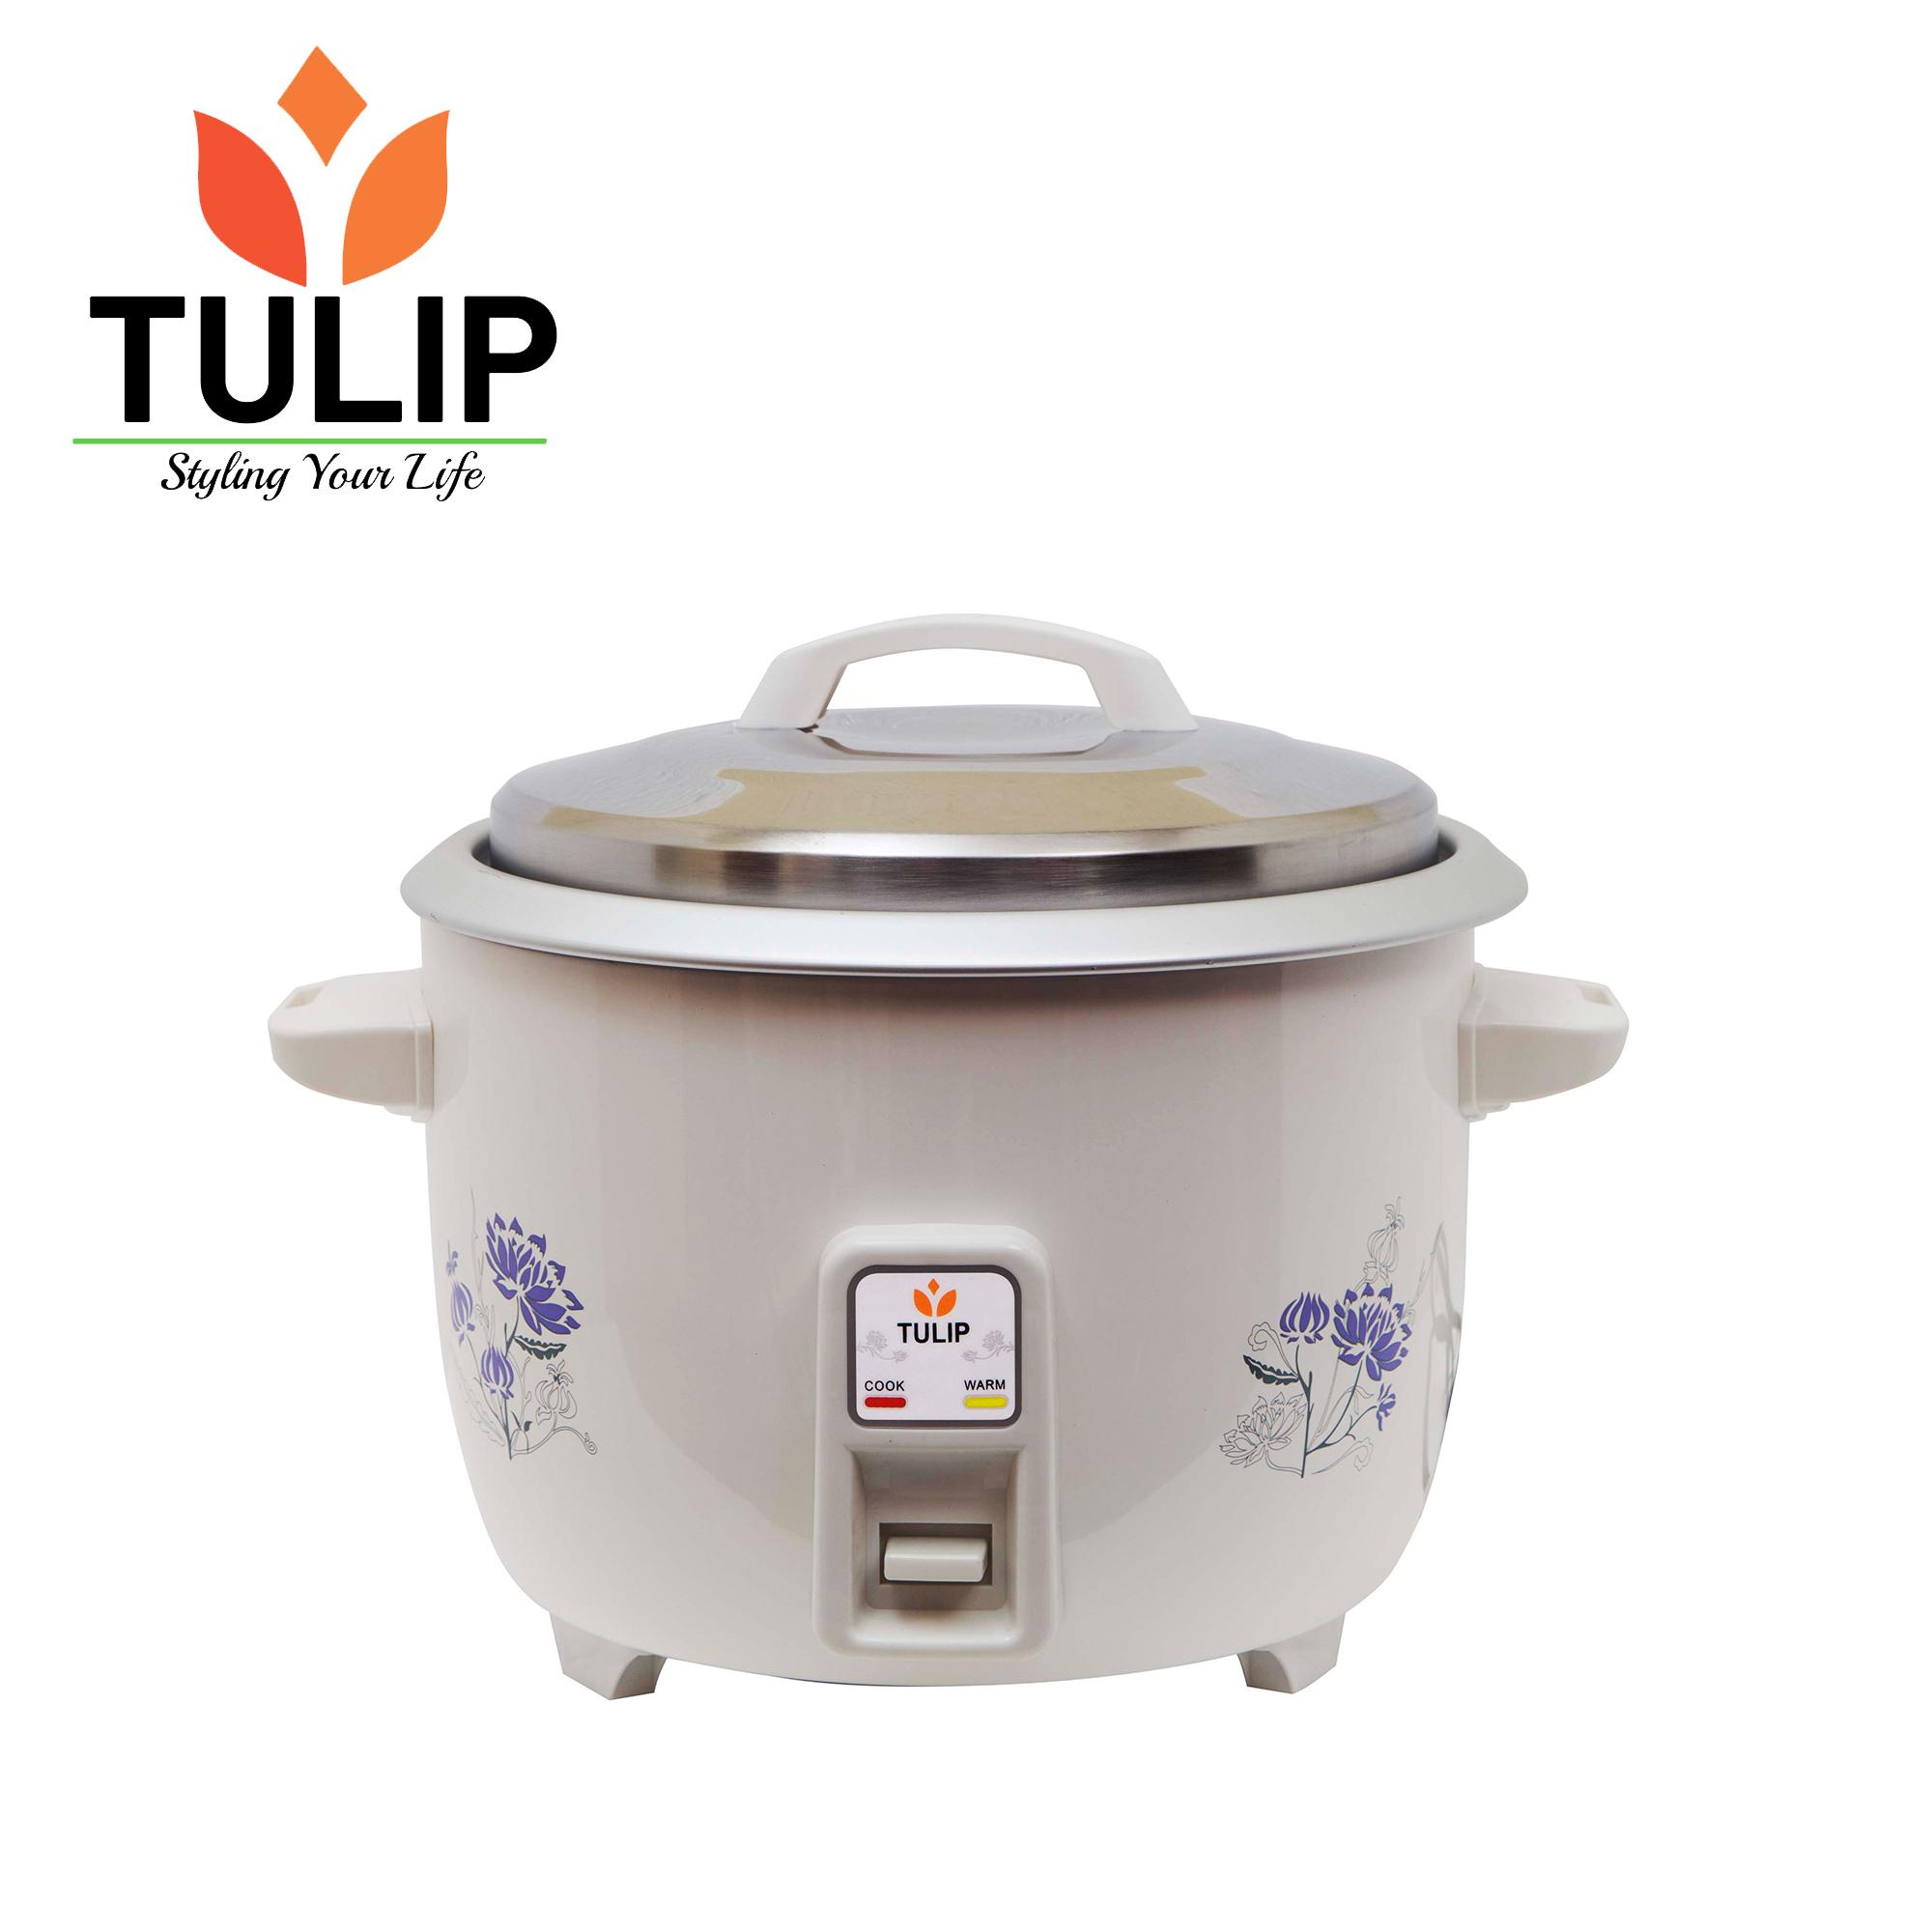 TULIP Regular REGAL PLAIN Rice cooker -3.6 ltr